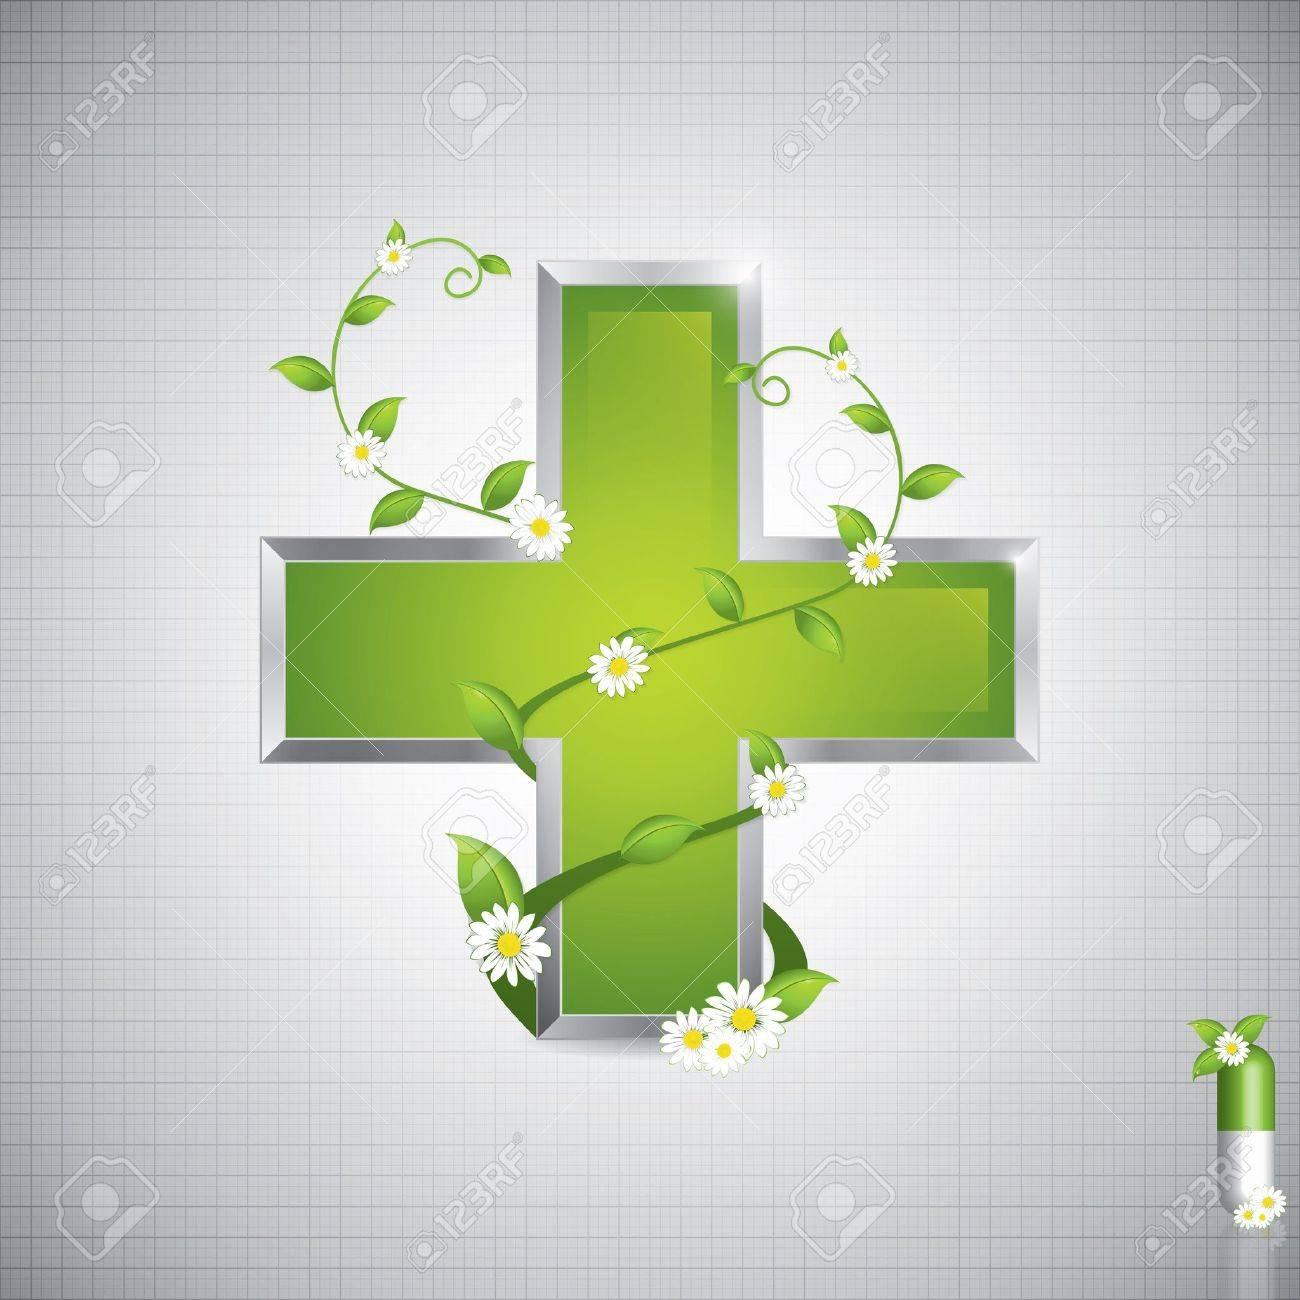 Alternative medication concept - medical cross caduceus style Stock Vector - 12185028